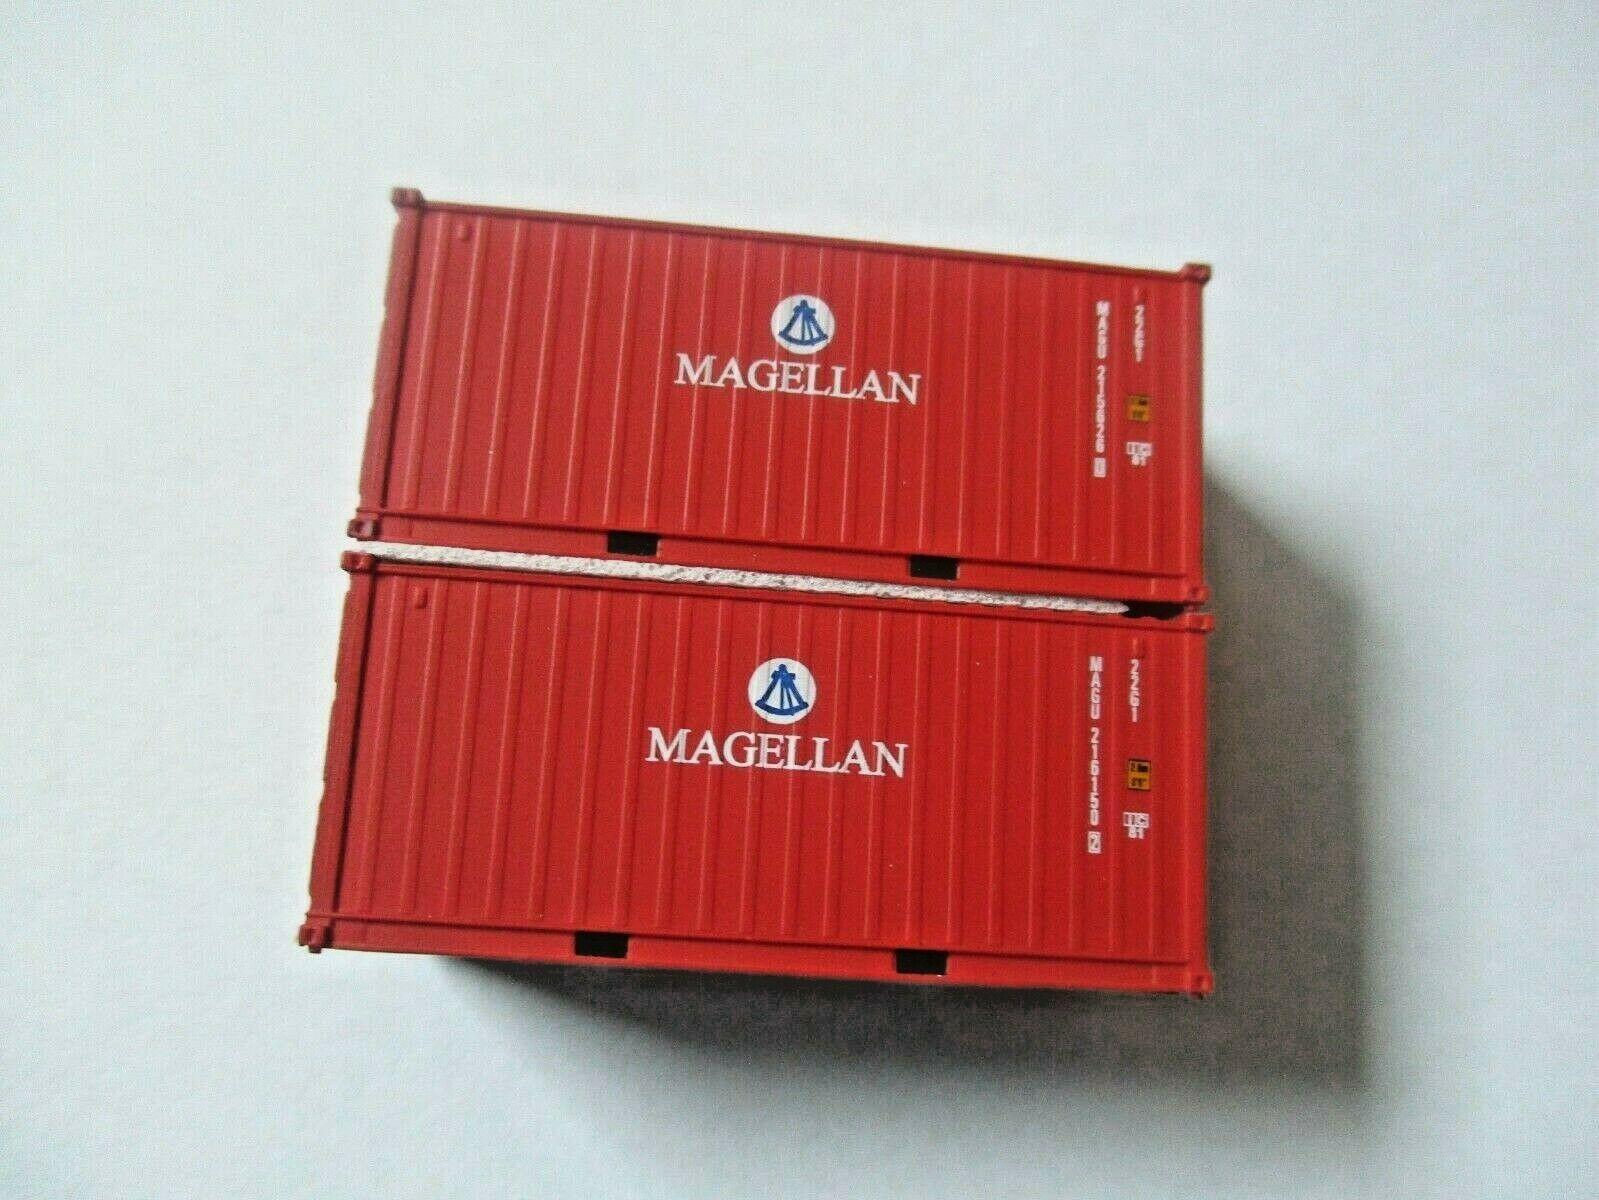 Jacksonville Terminal Company # 205383 MAGELLAN (MAGU) 20' Standard Container